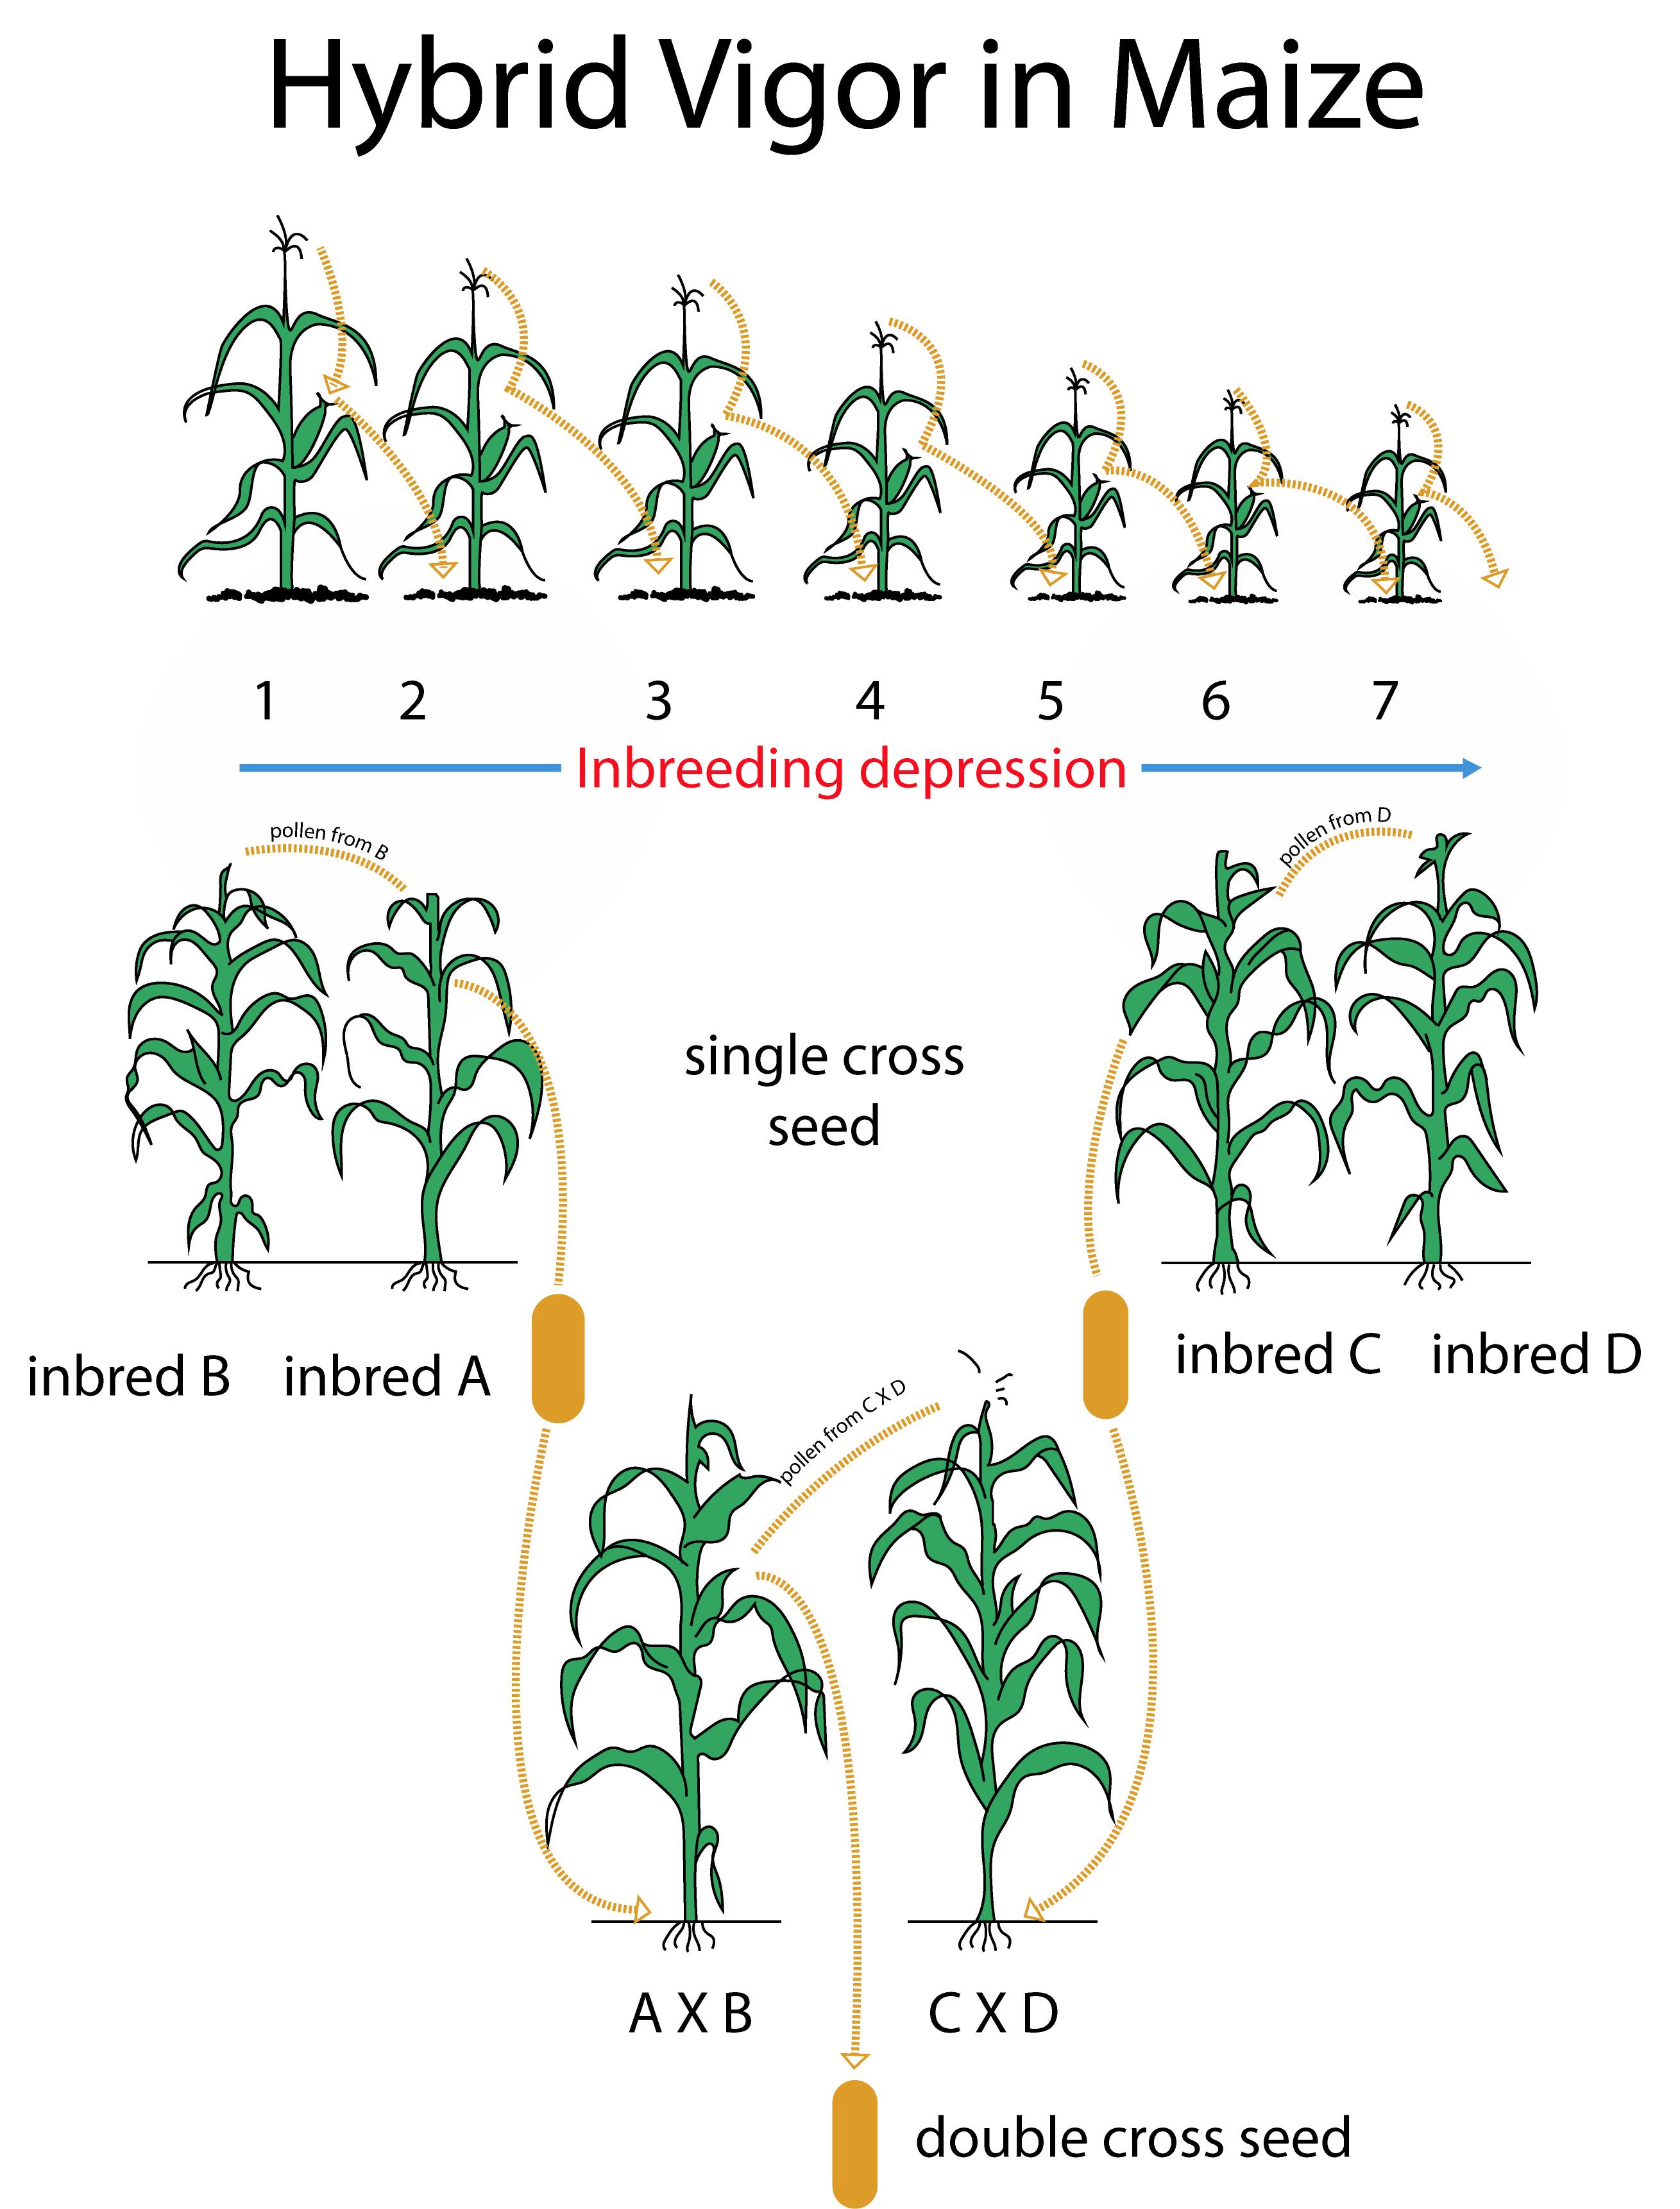 Inbreeding depression and Hybrid vigor in maize